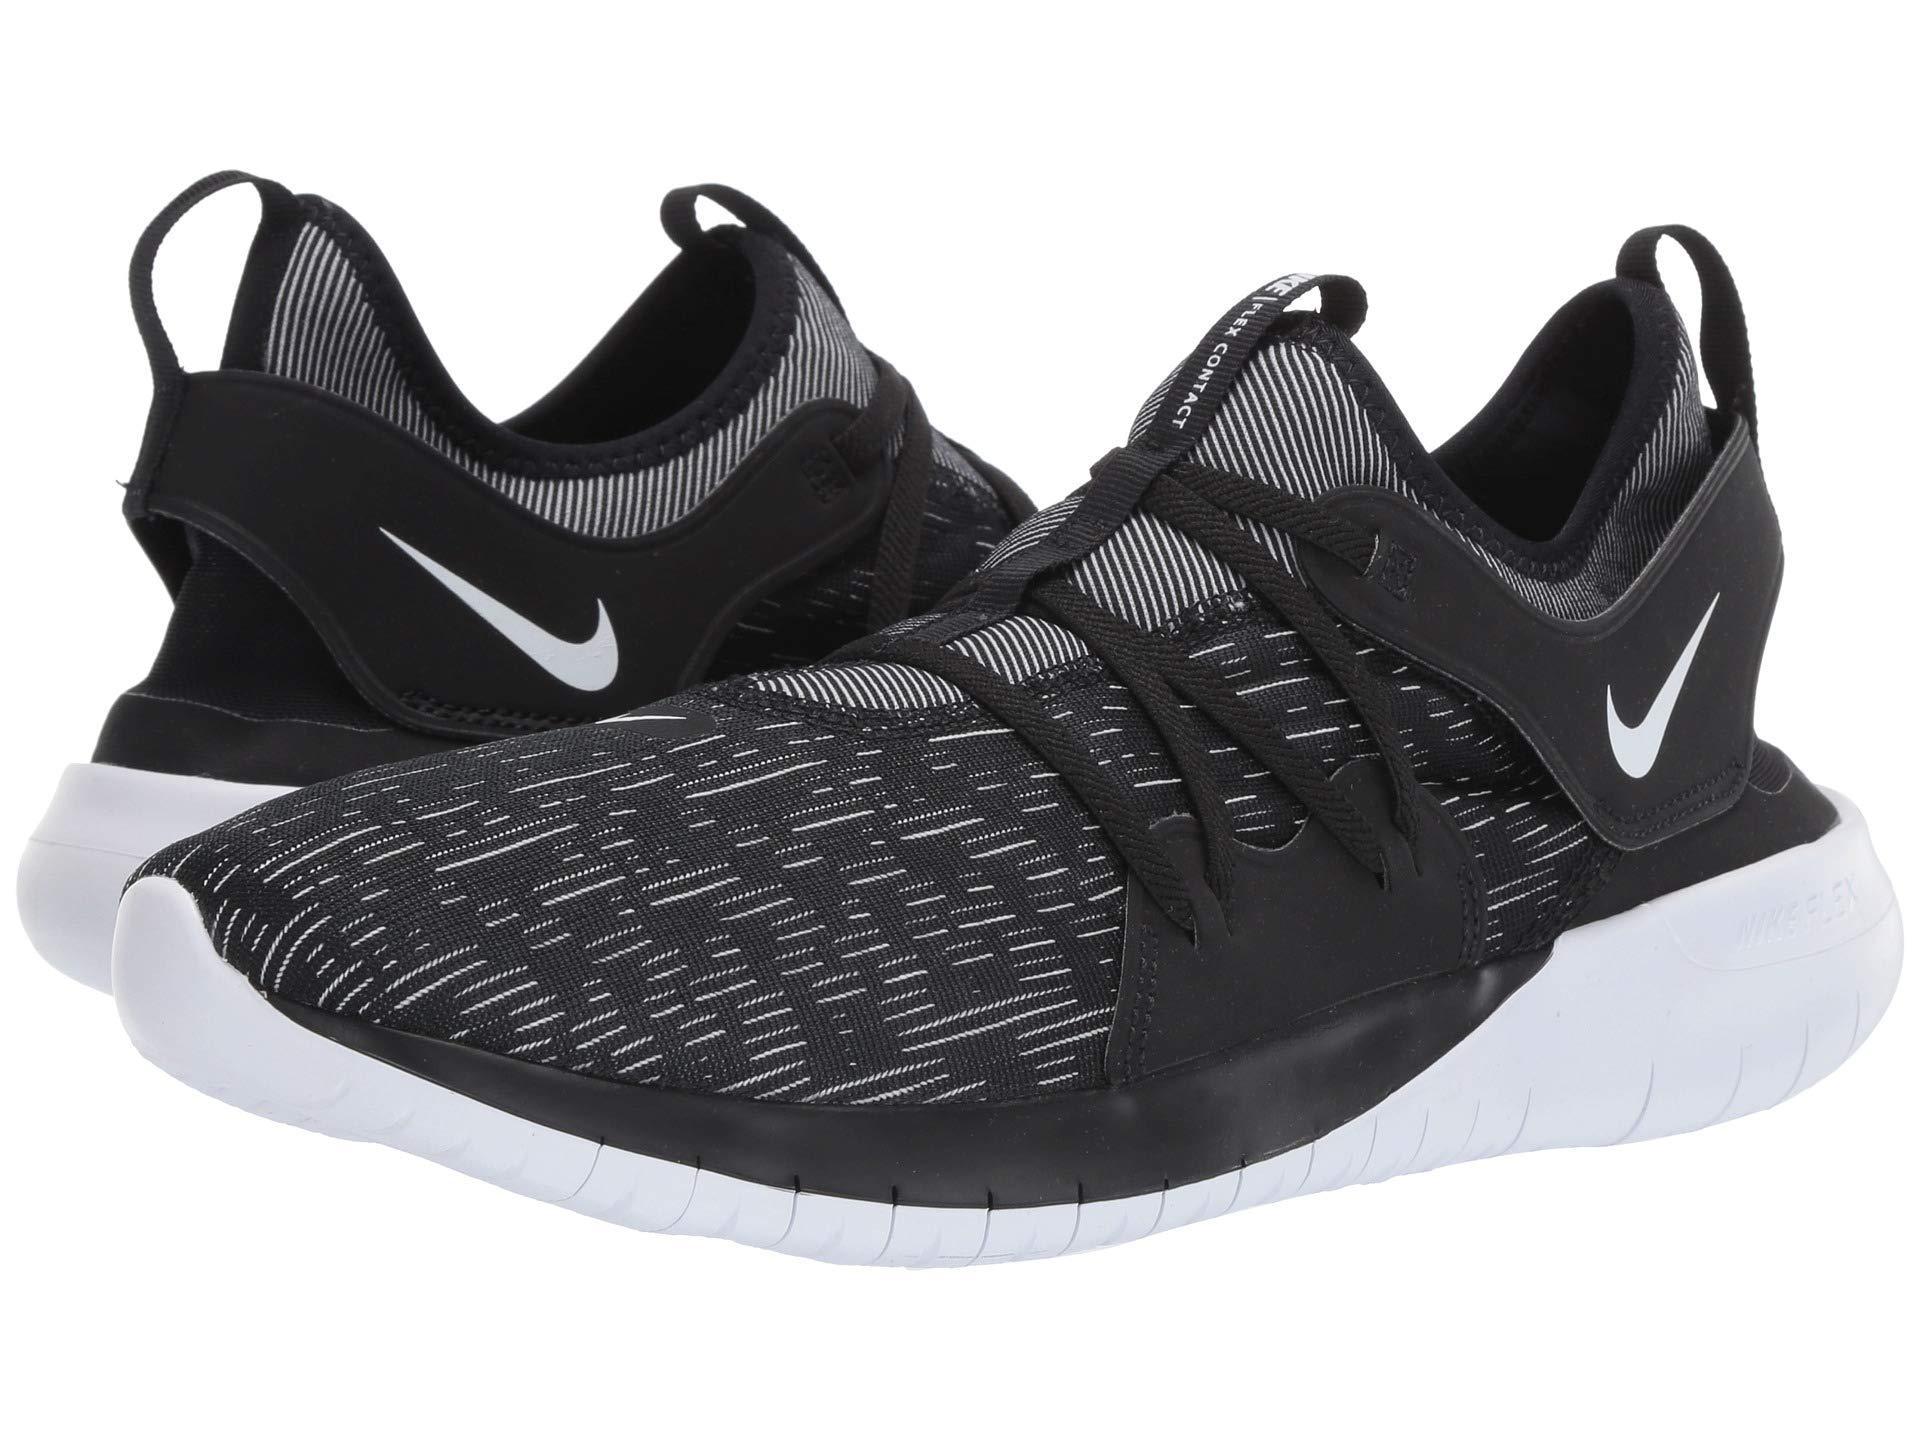 e900d6b6af6ce Nike. Flex Contact 3 (black university Red white) Men s Running Shoes